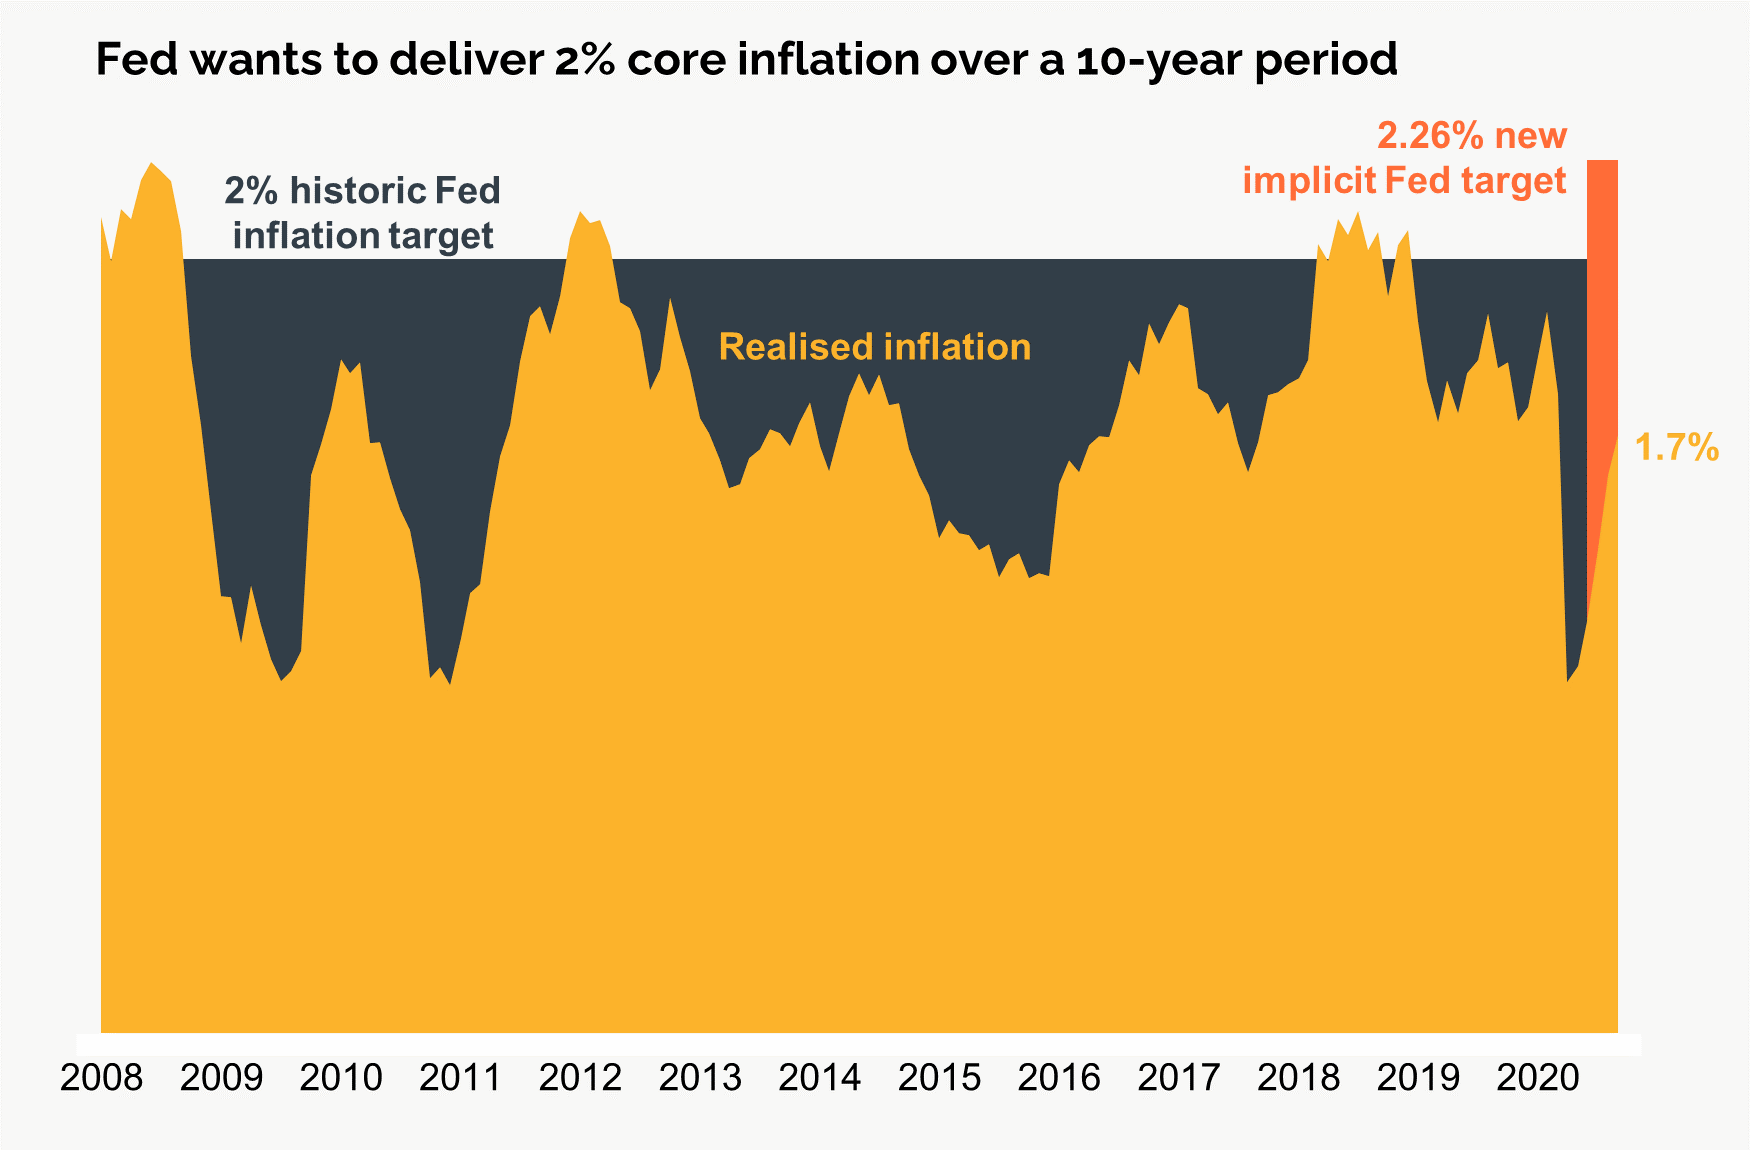 Fed Wants to Deliver 2% inflationv2